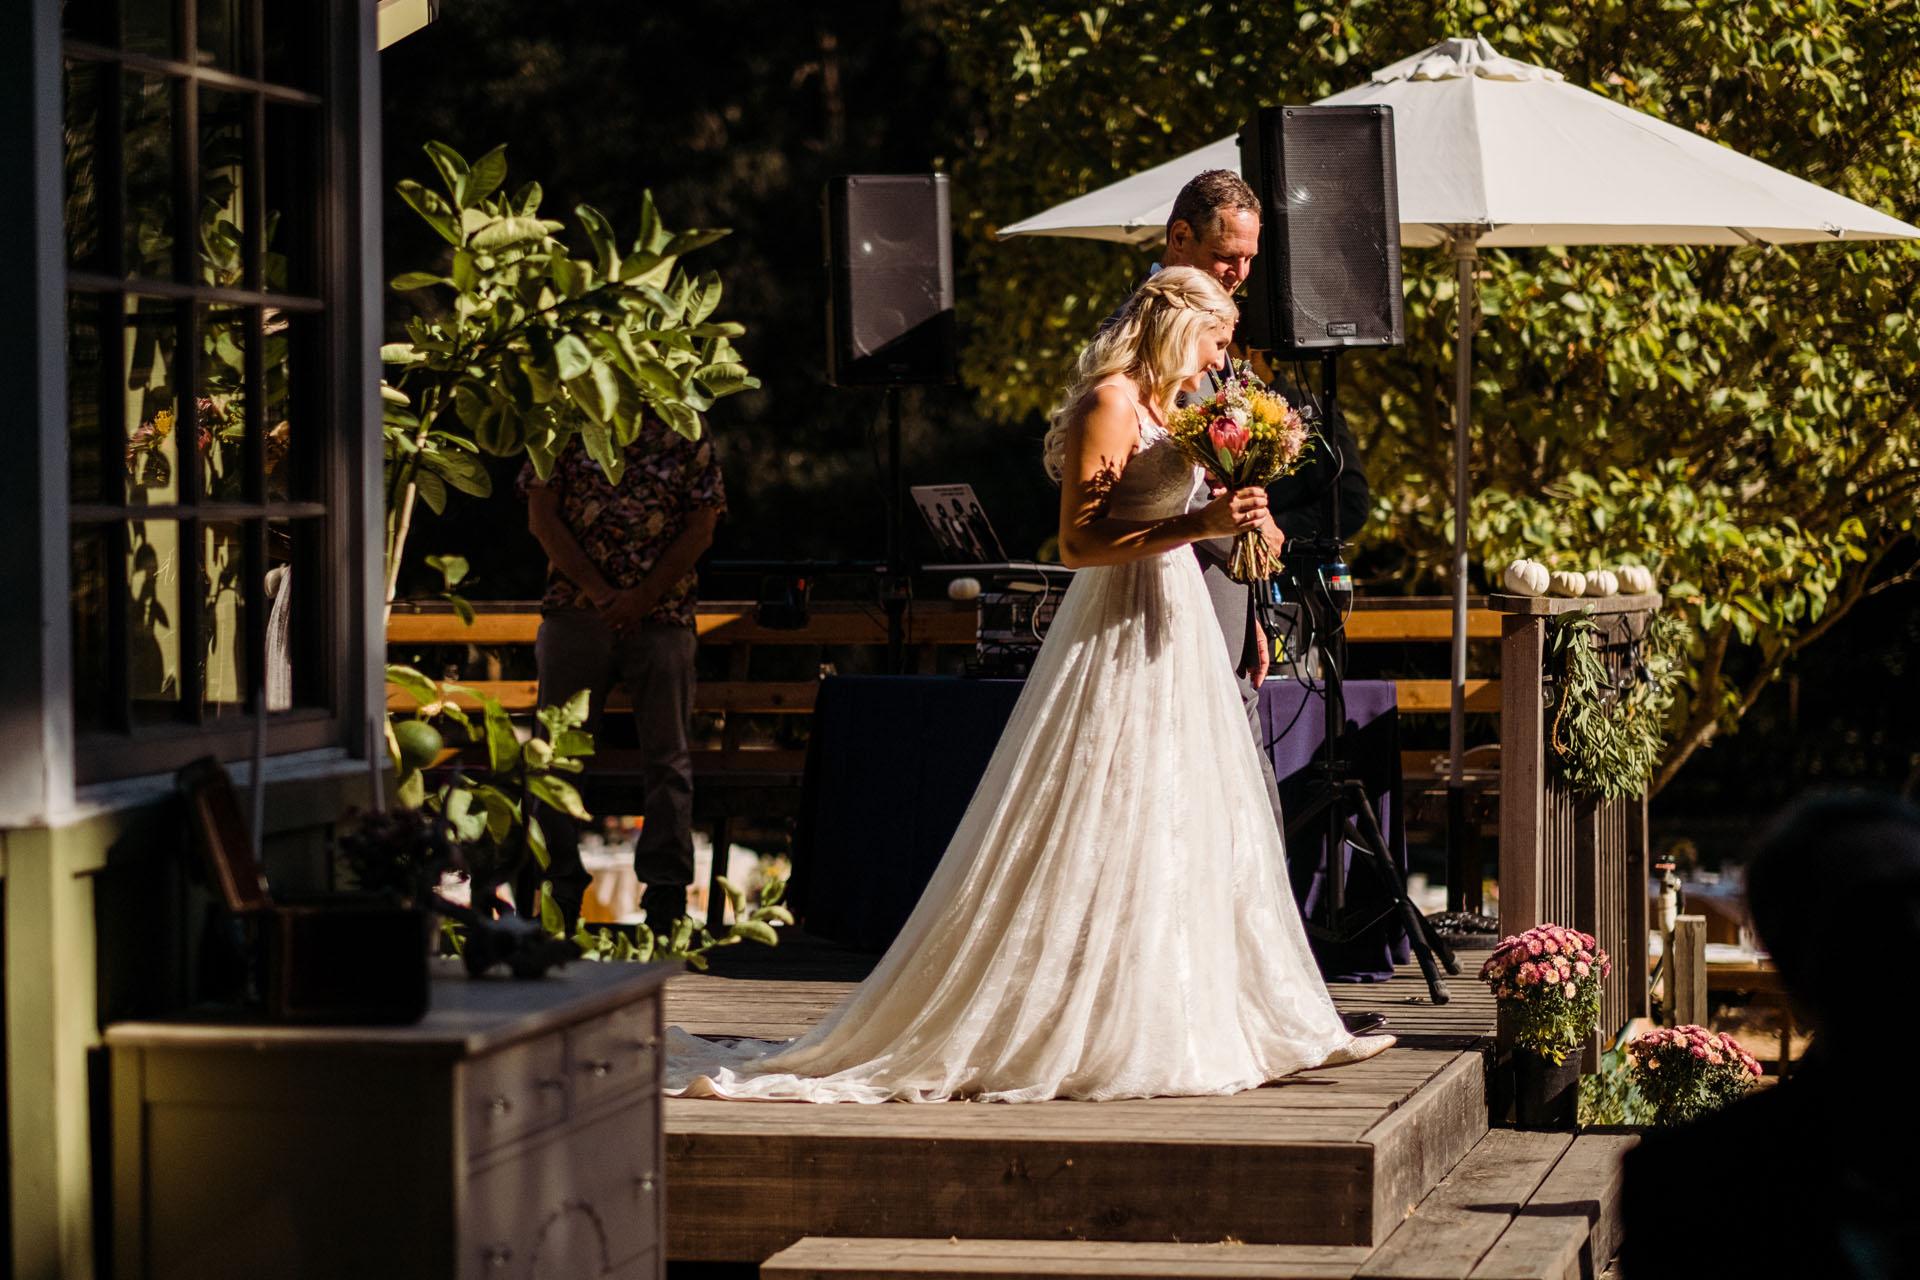 10-7-17 Devon and Jordan's Wedding-292.jpg